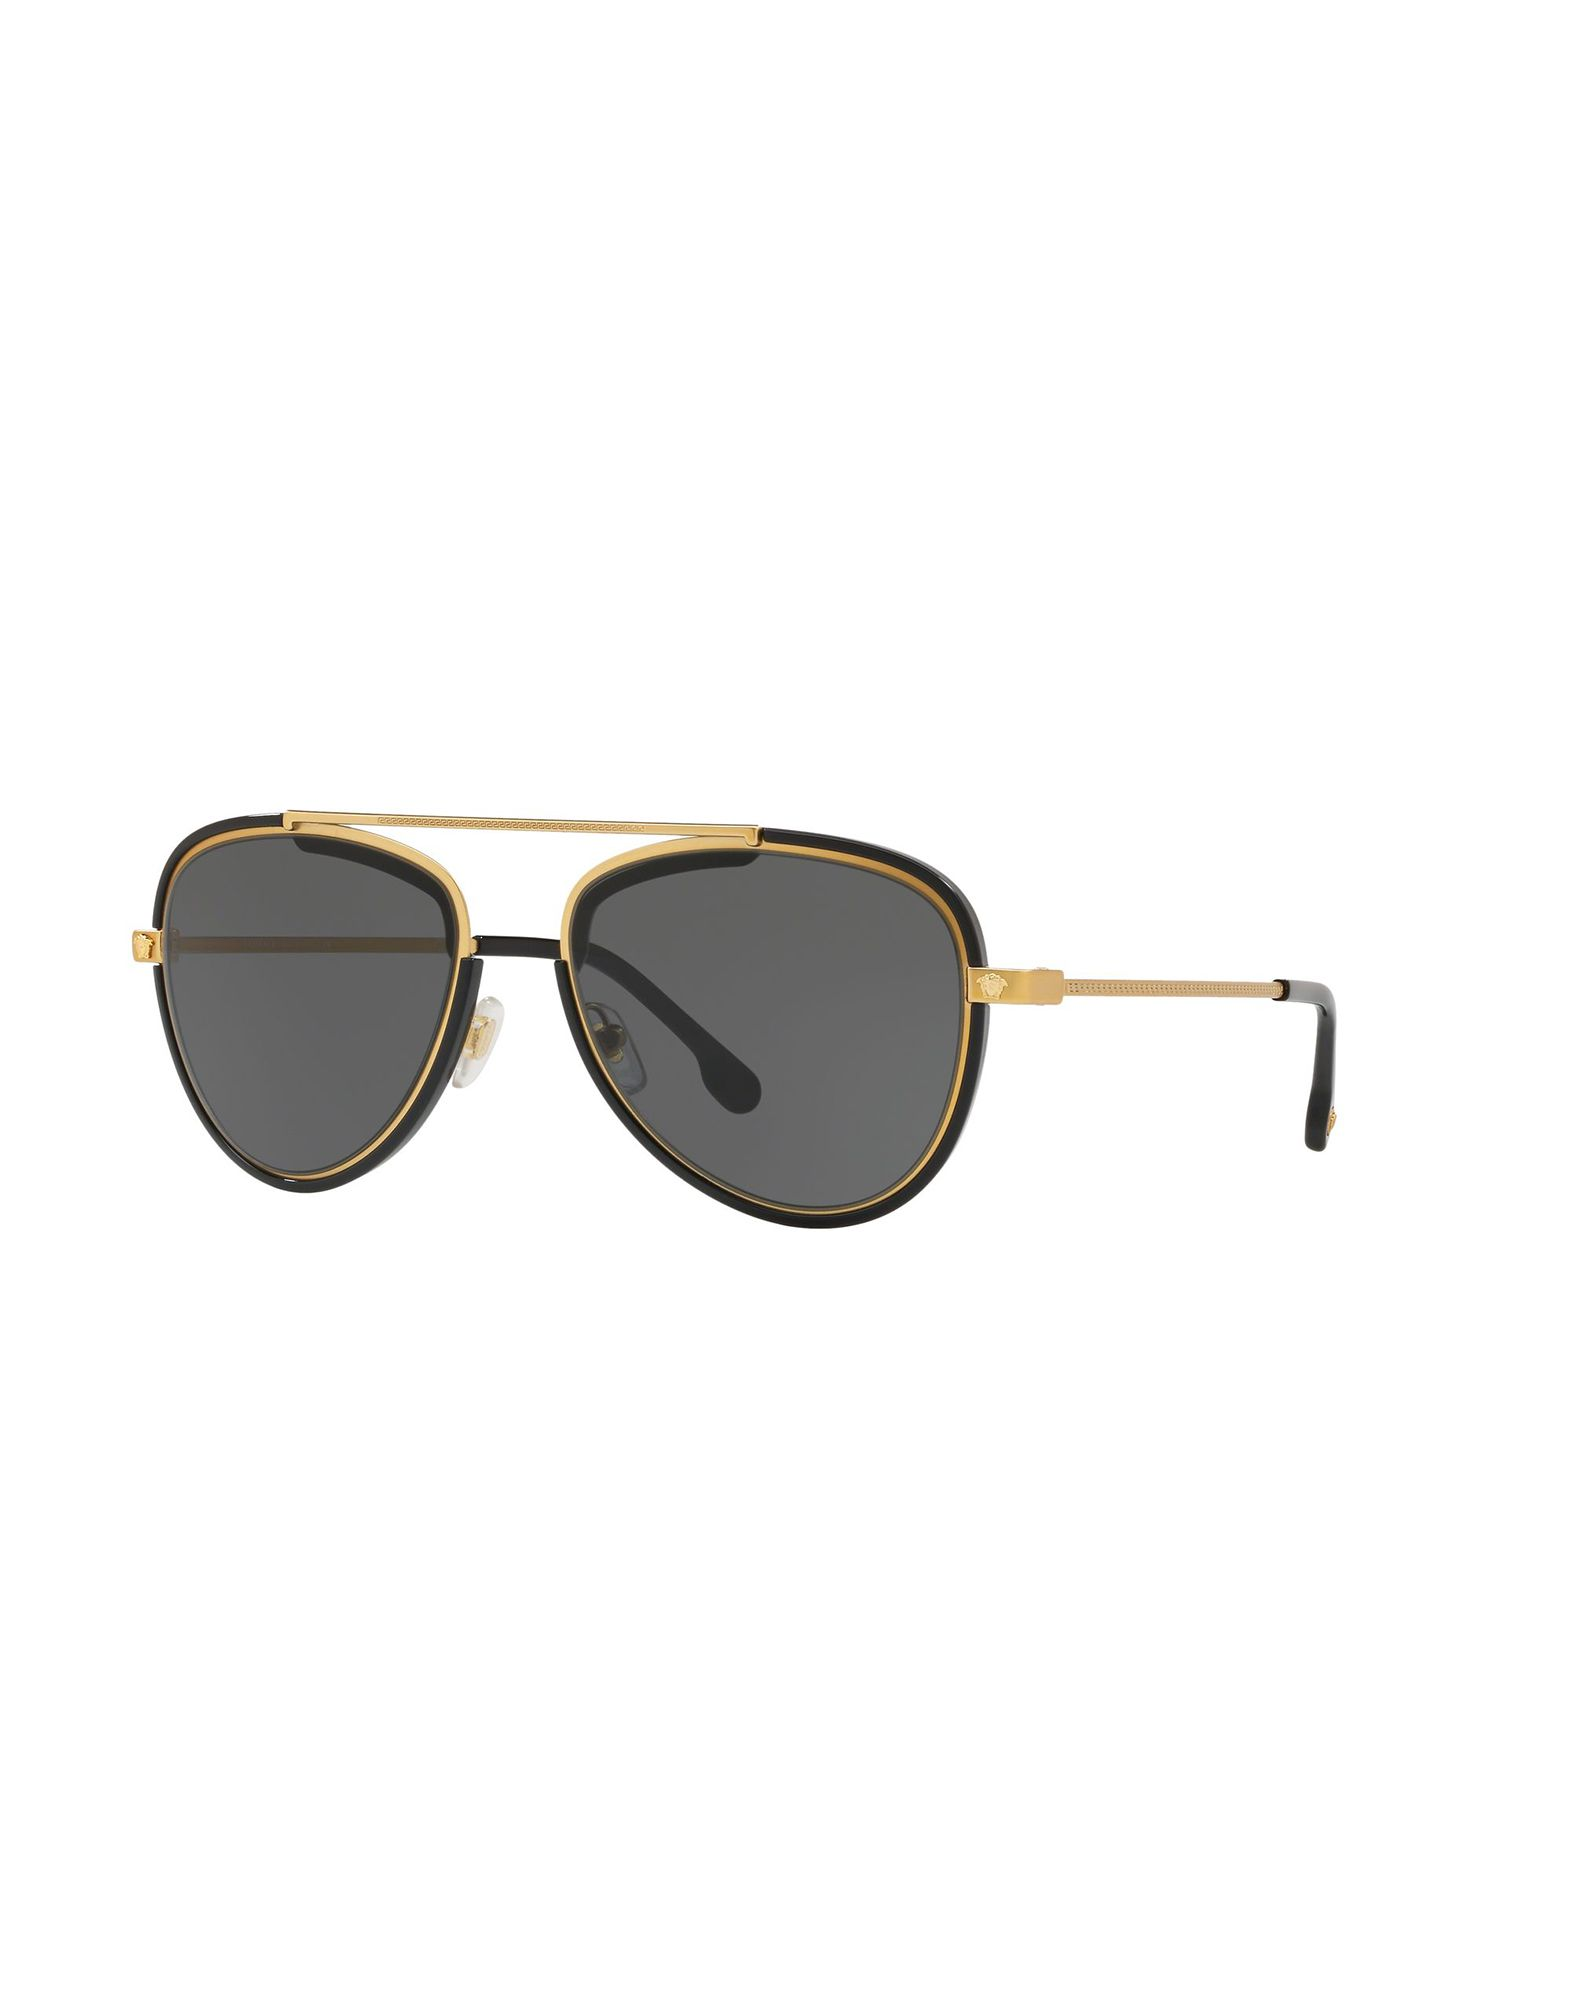 8b22a4c8e4 Gafas de sol - Accesorios | Buyviu.com